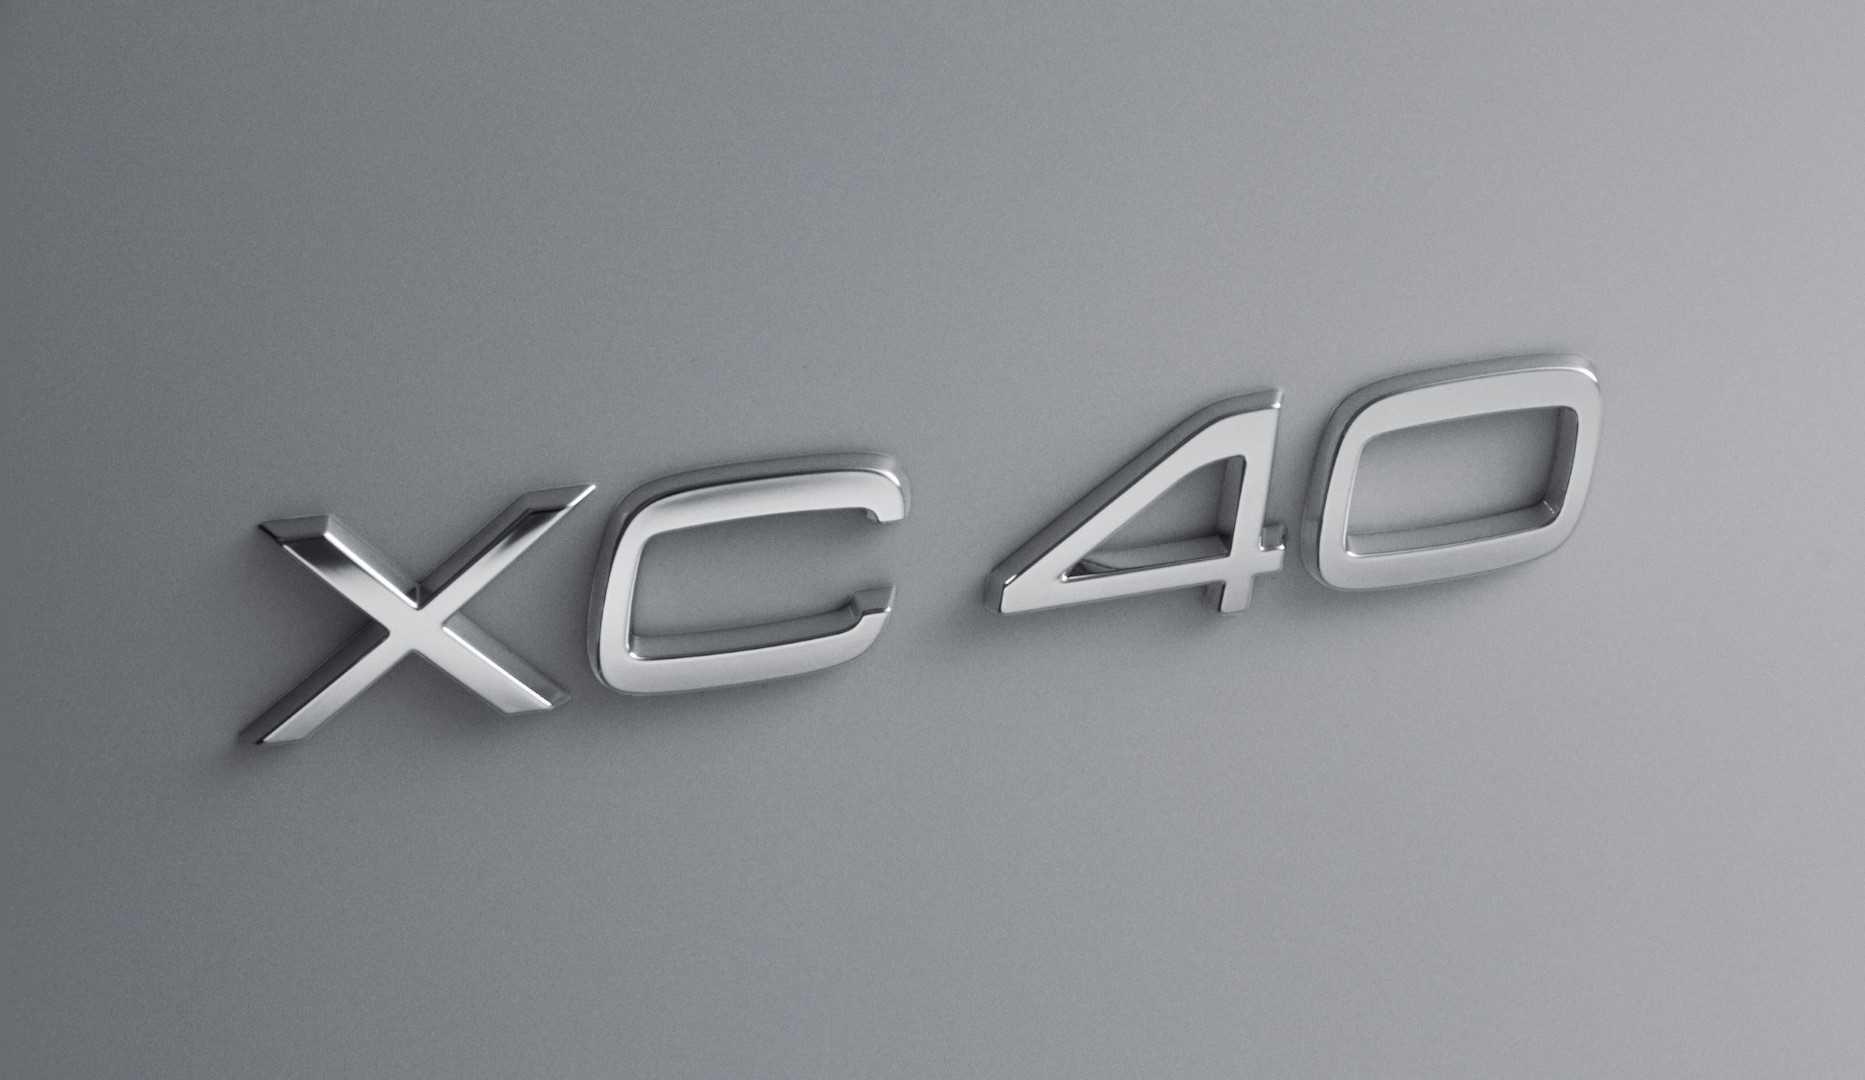 Volvo XC40 2018 (teaser)